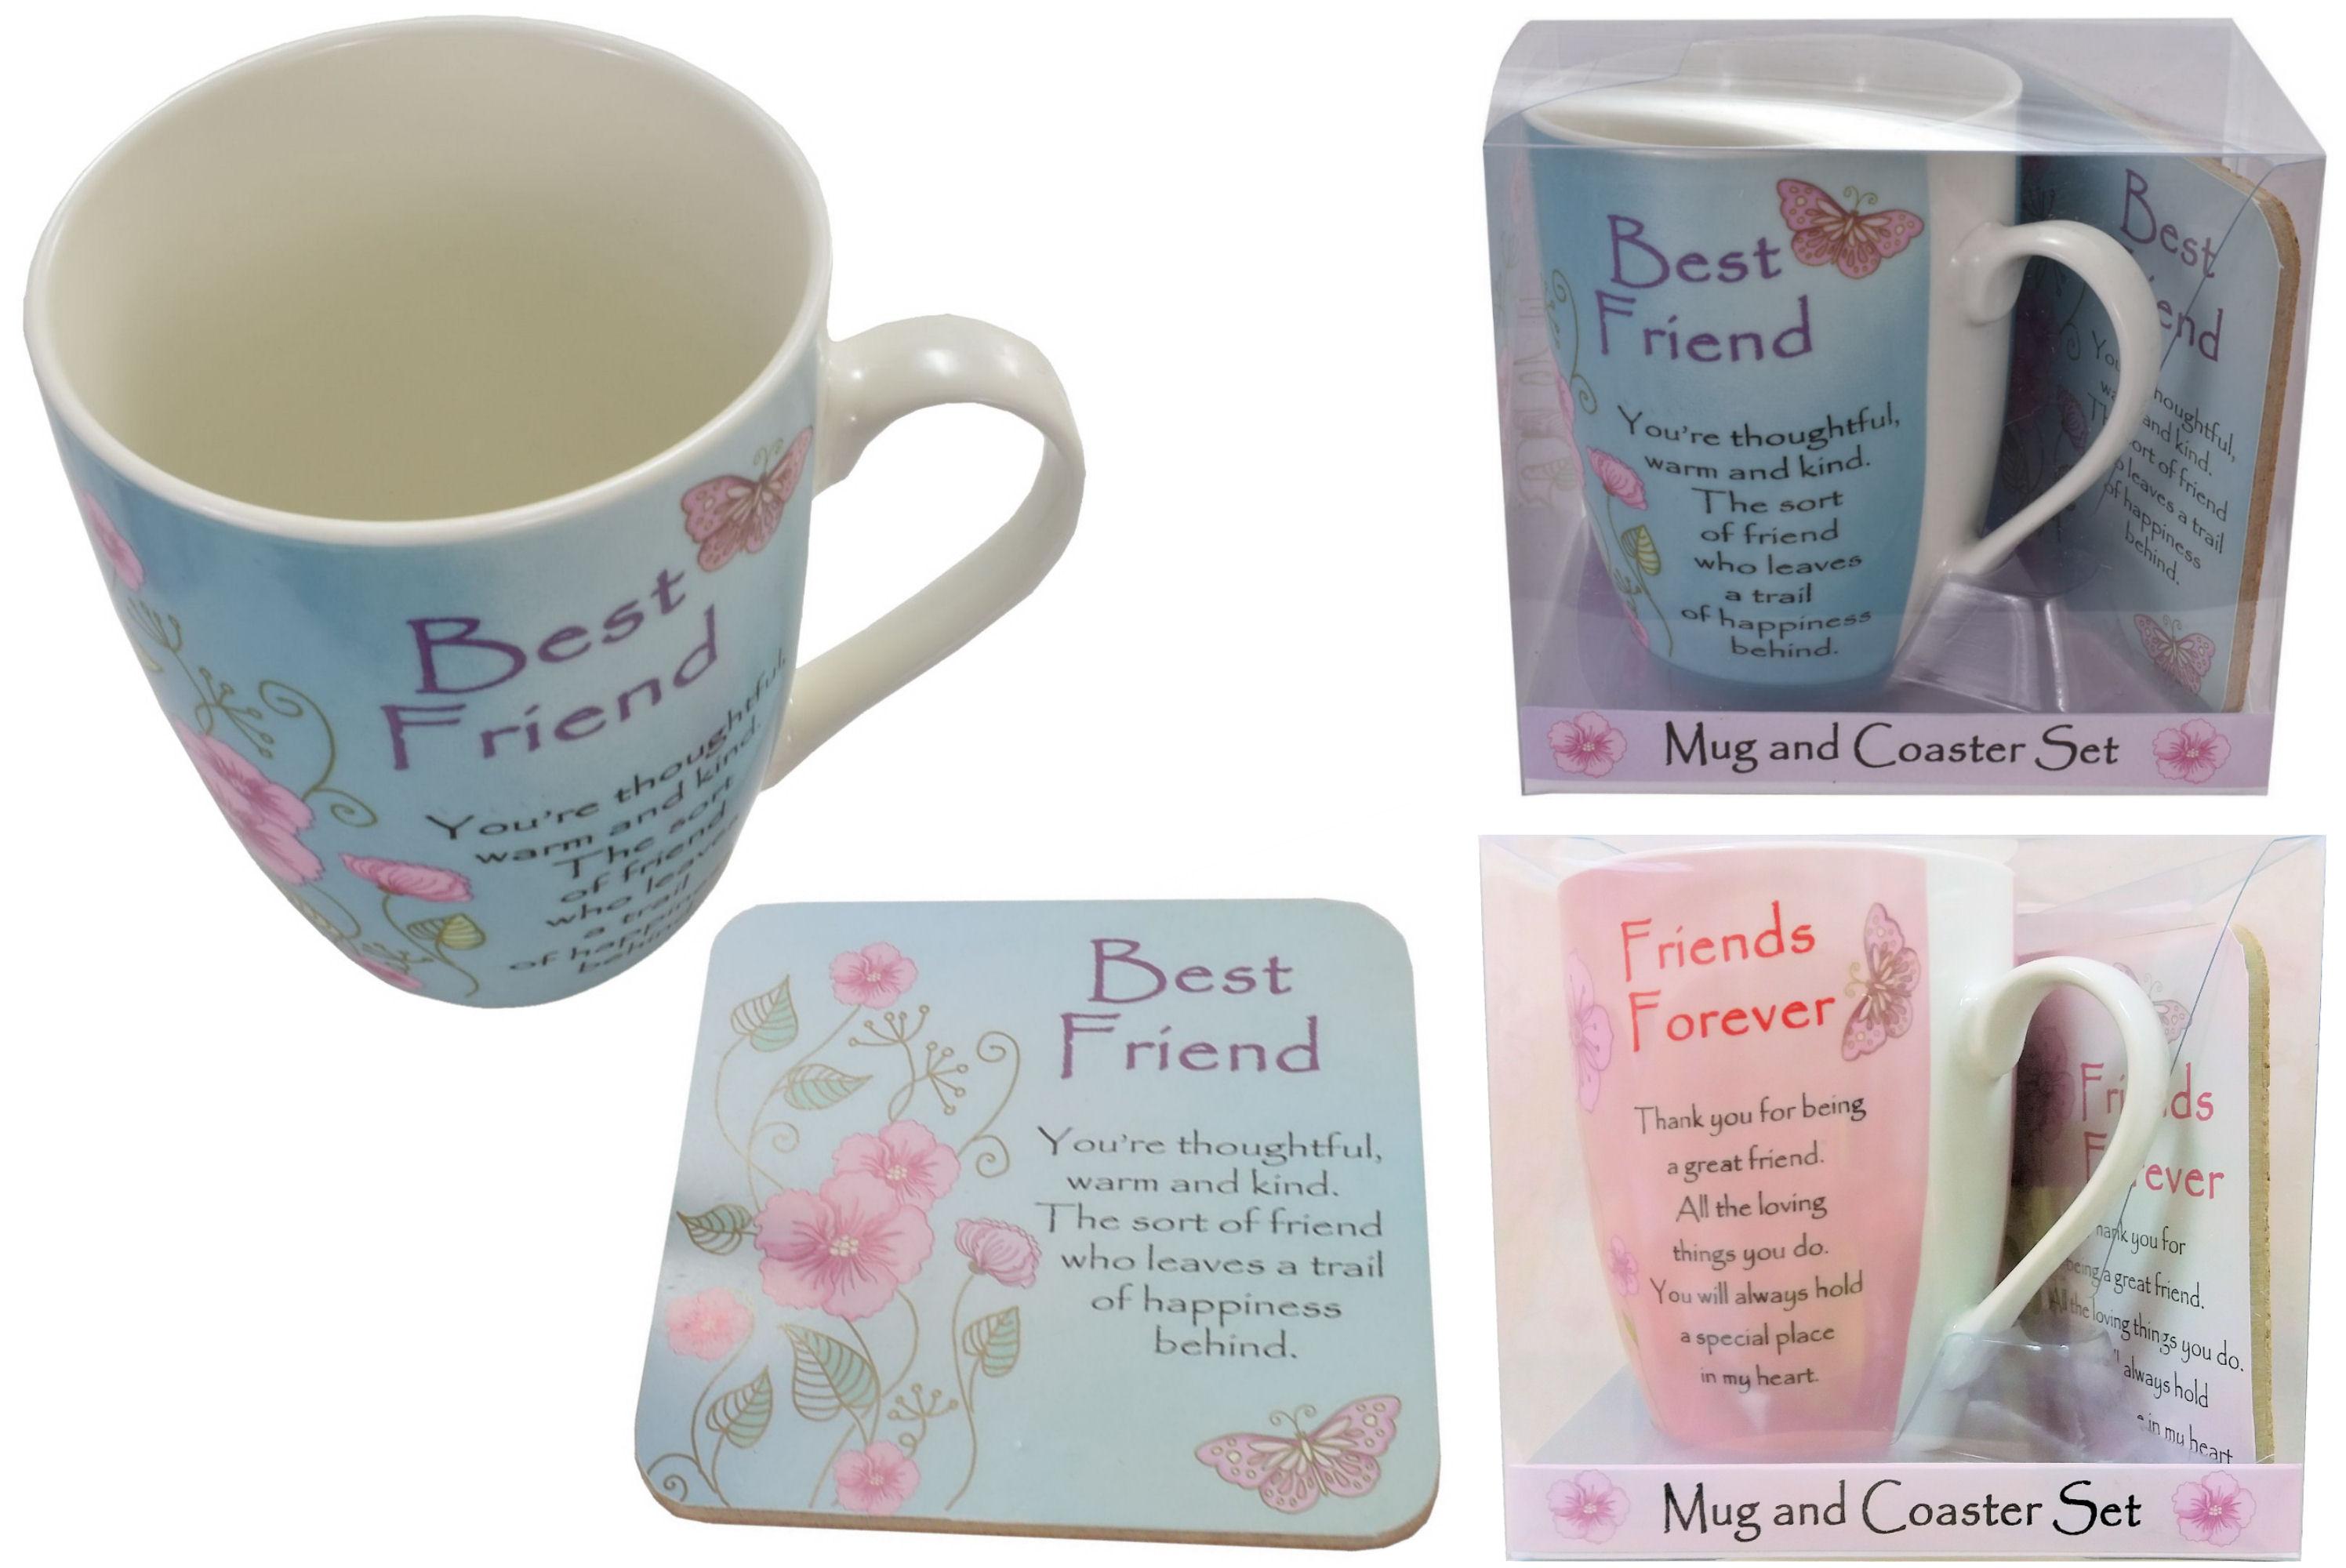 Friends Forever Mug & Coaster Set In Acetate Box 2 Asst